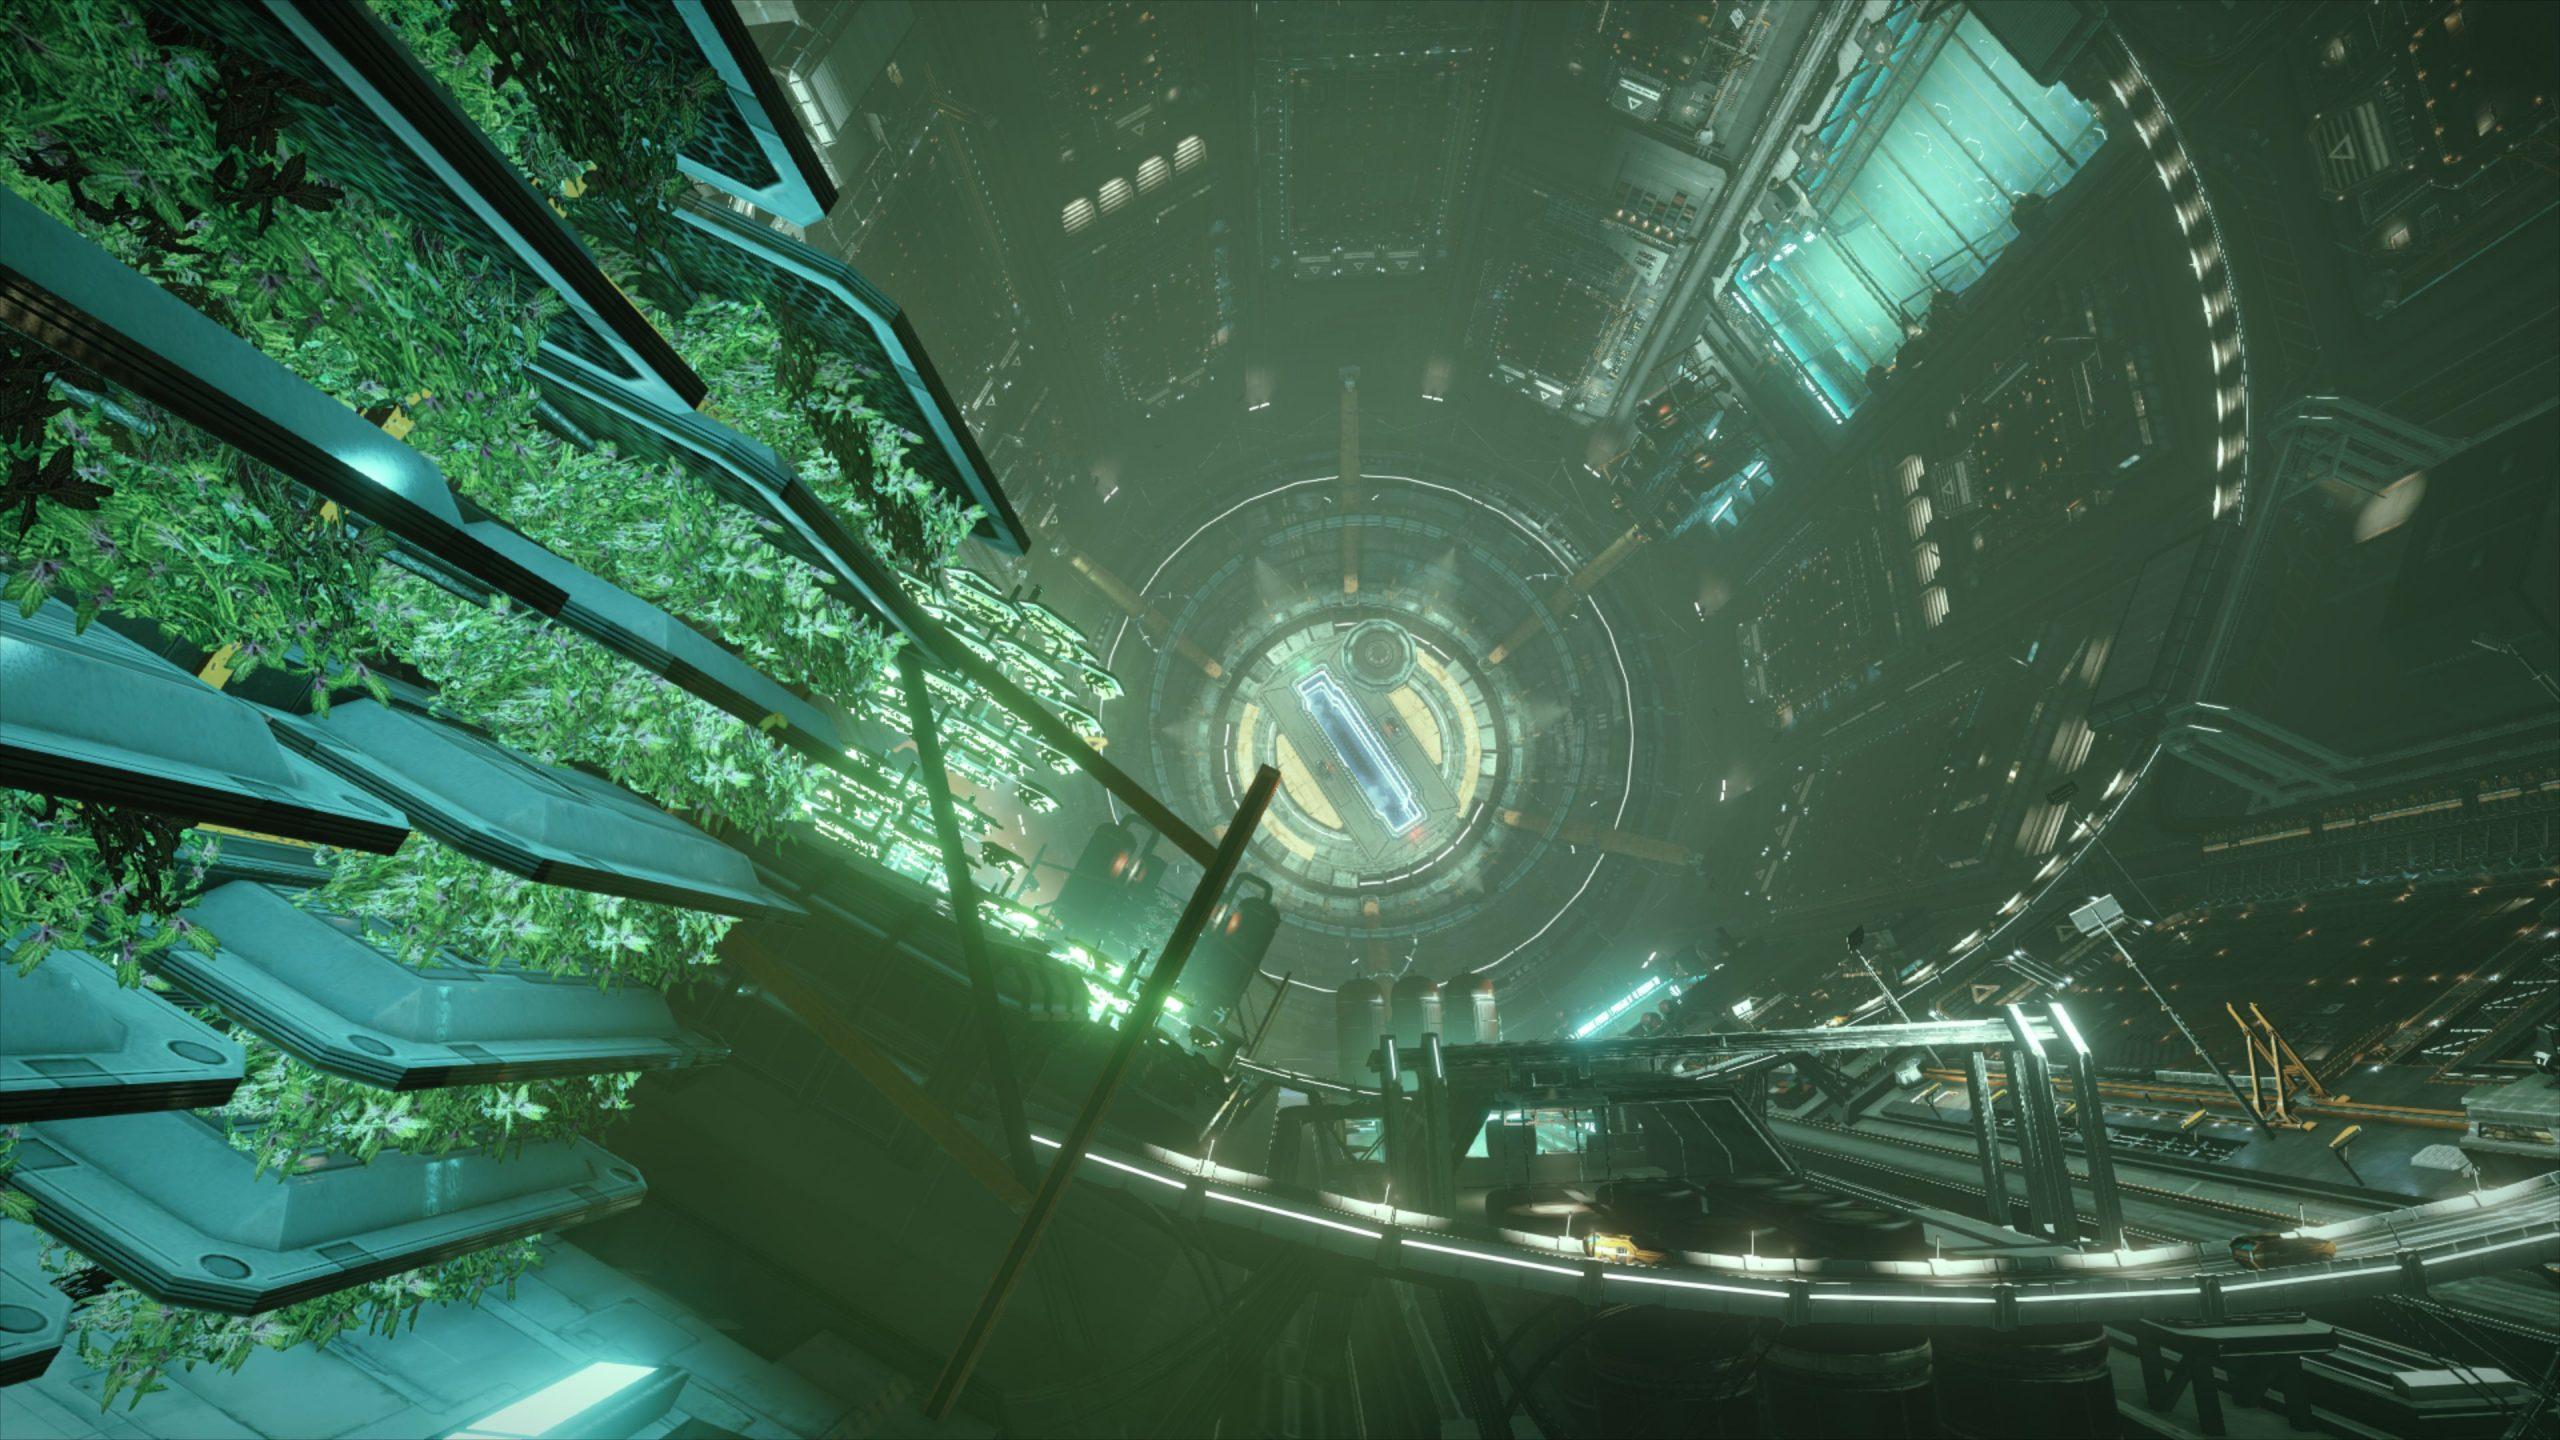 Lave-Station-Hydroponics-scaled.jpg